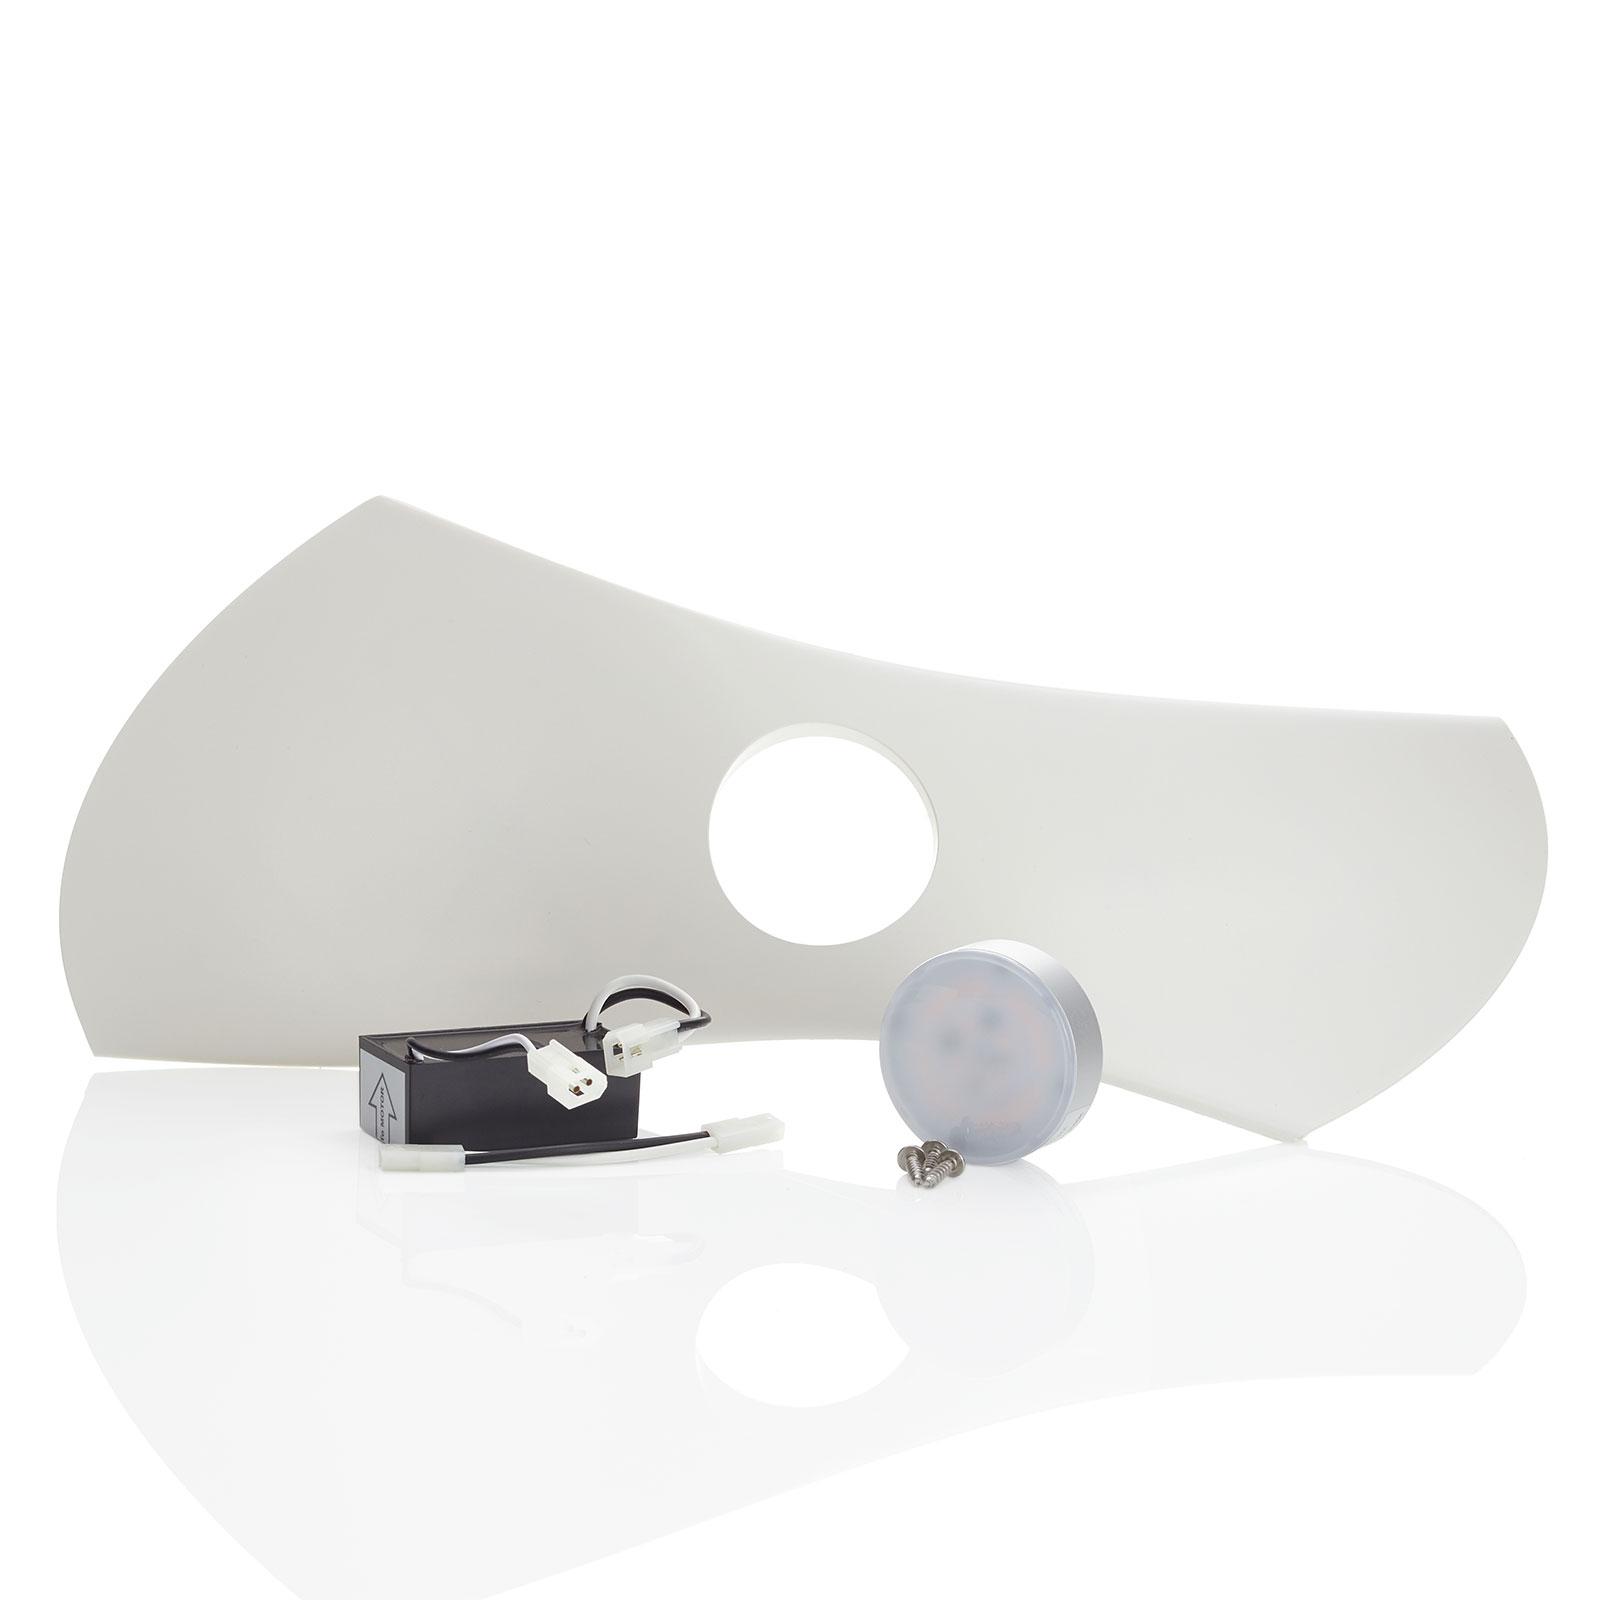 Acquista Aeratron kit di LED per ventilatori AE2+, bianco